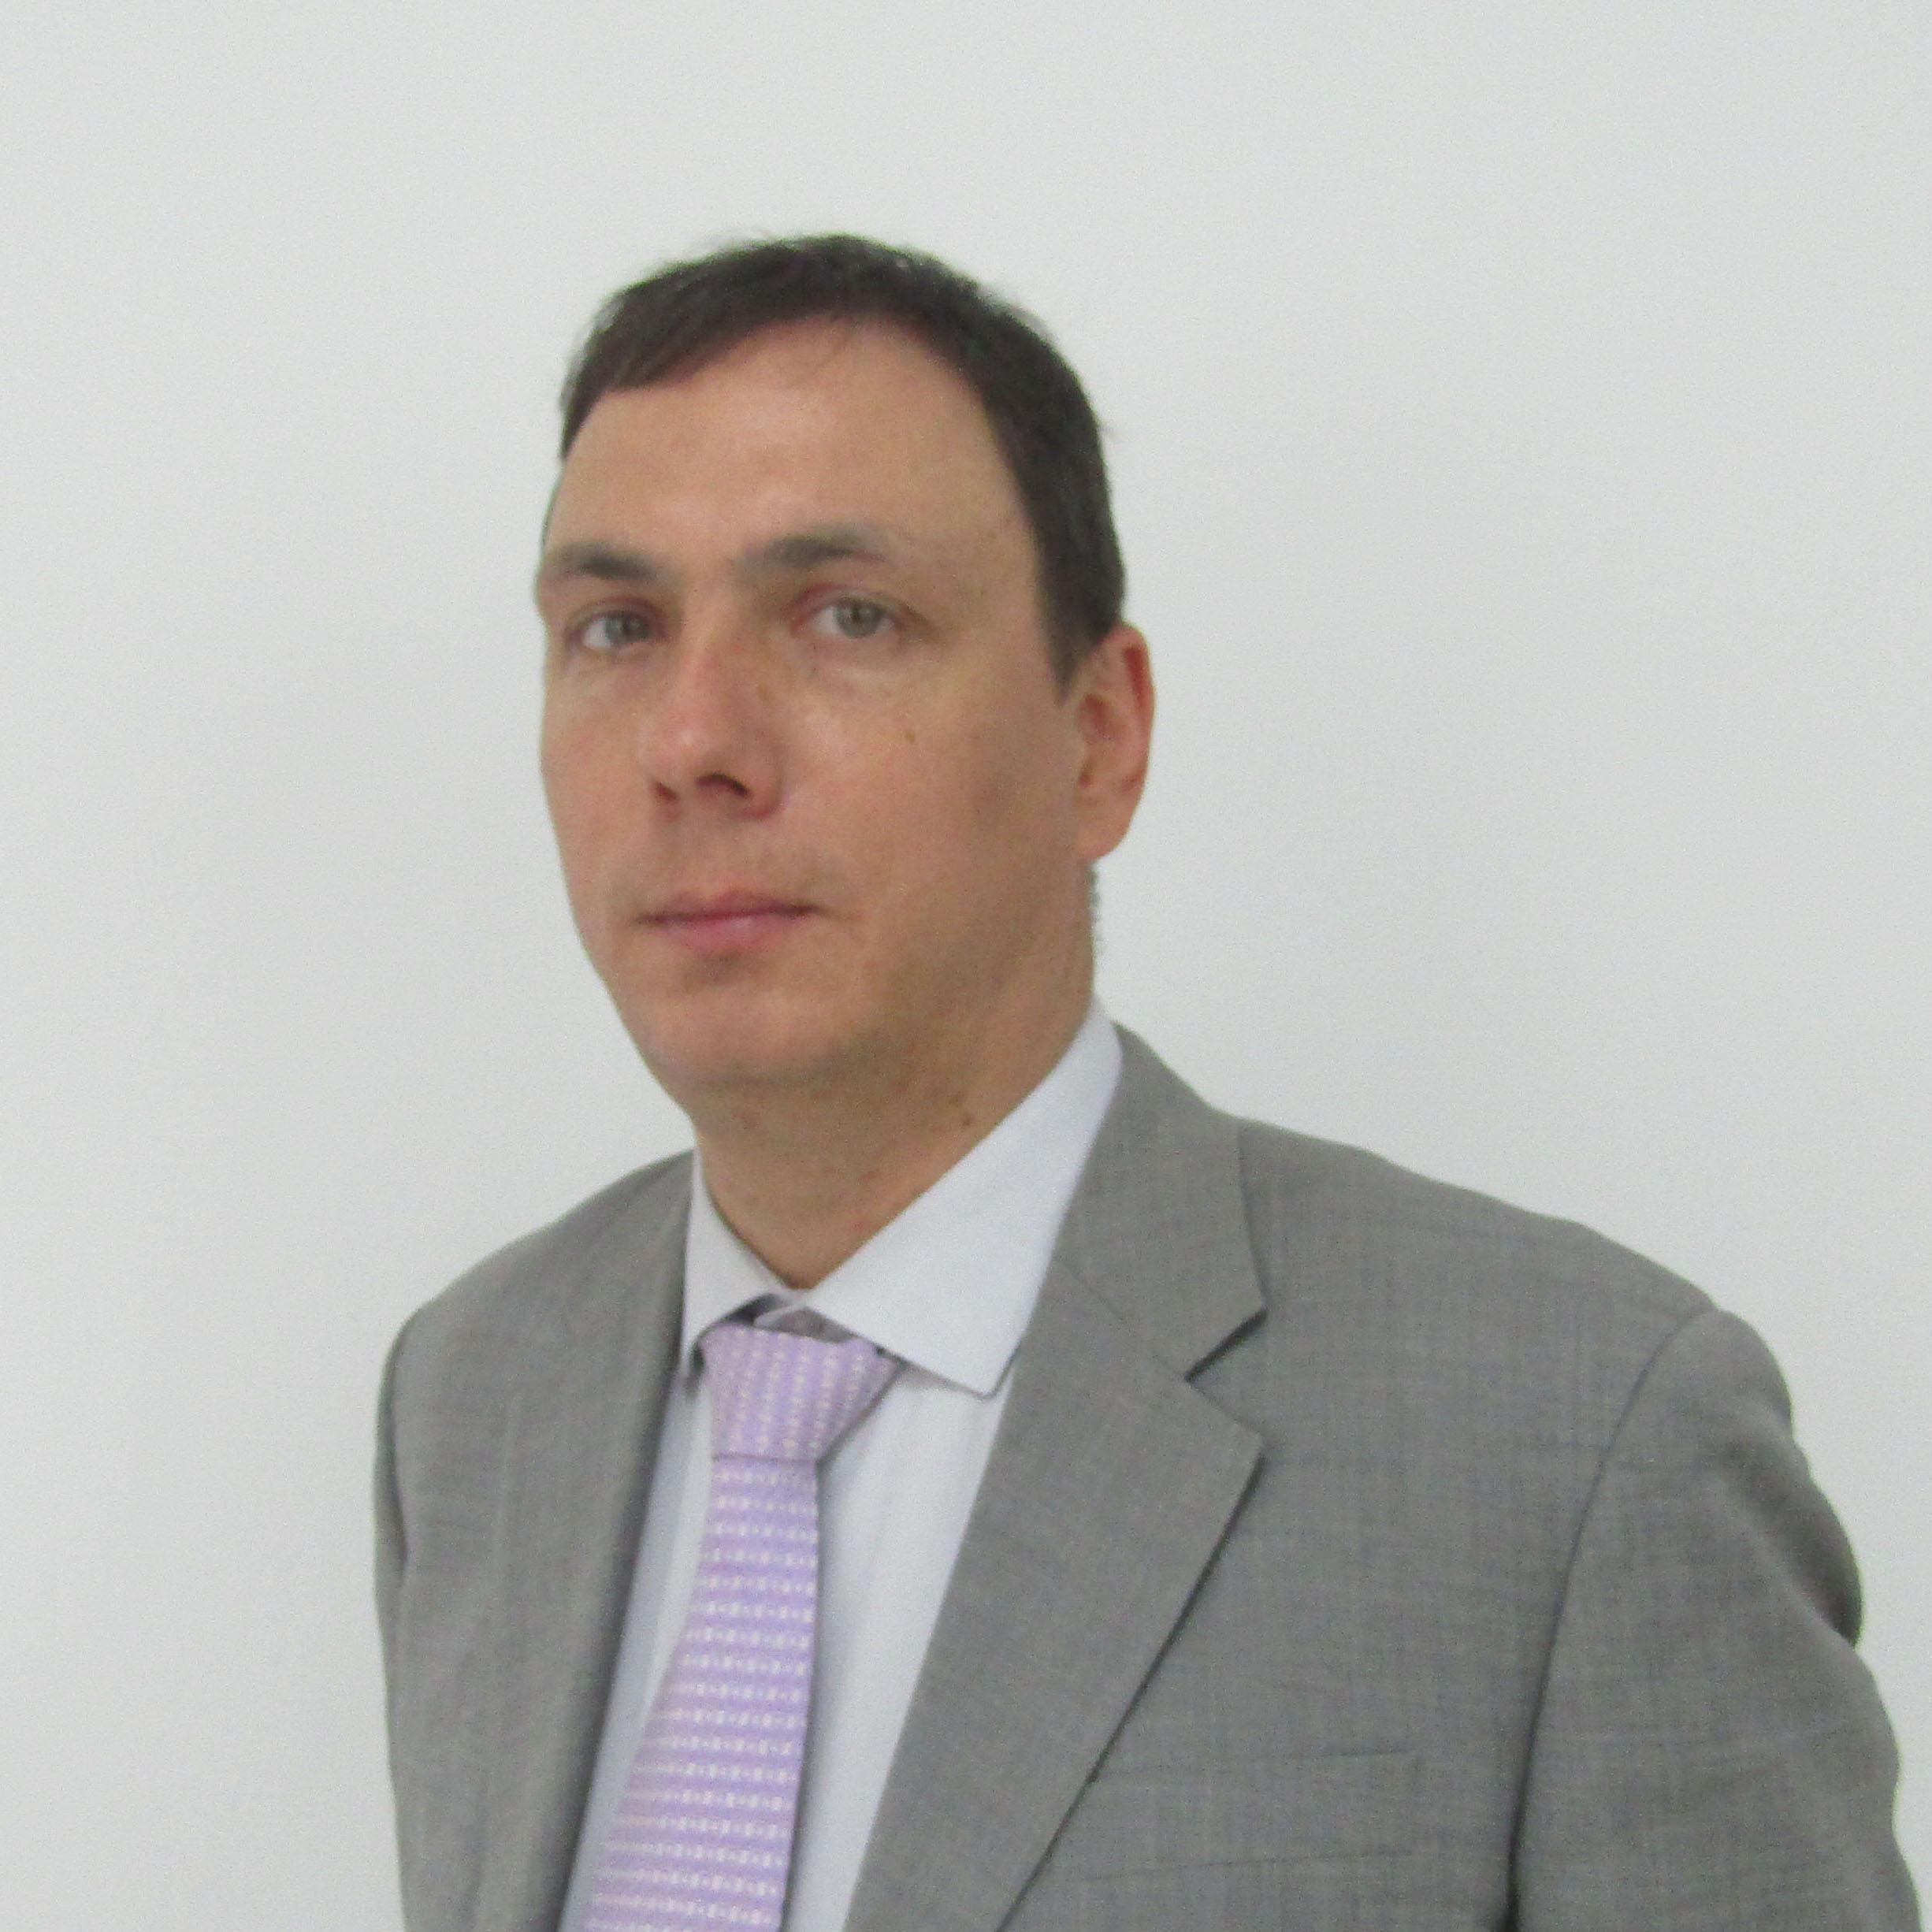 Pavel Beglov